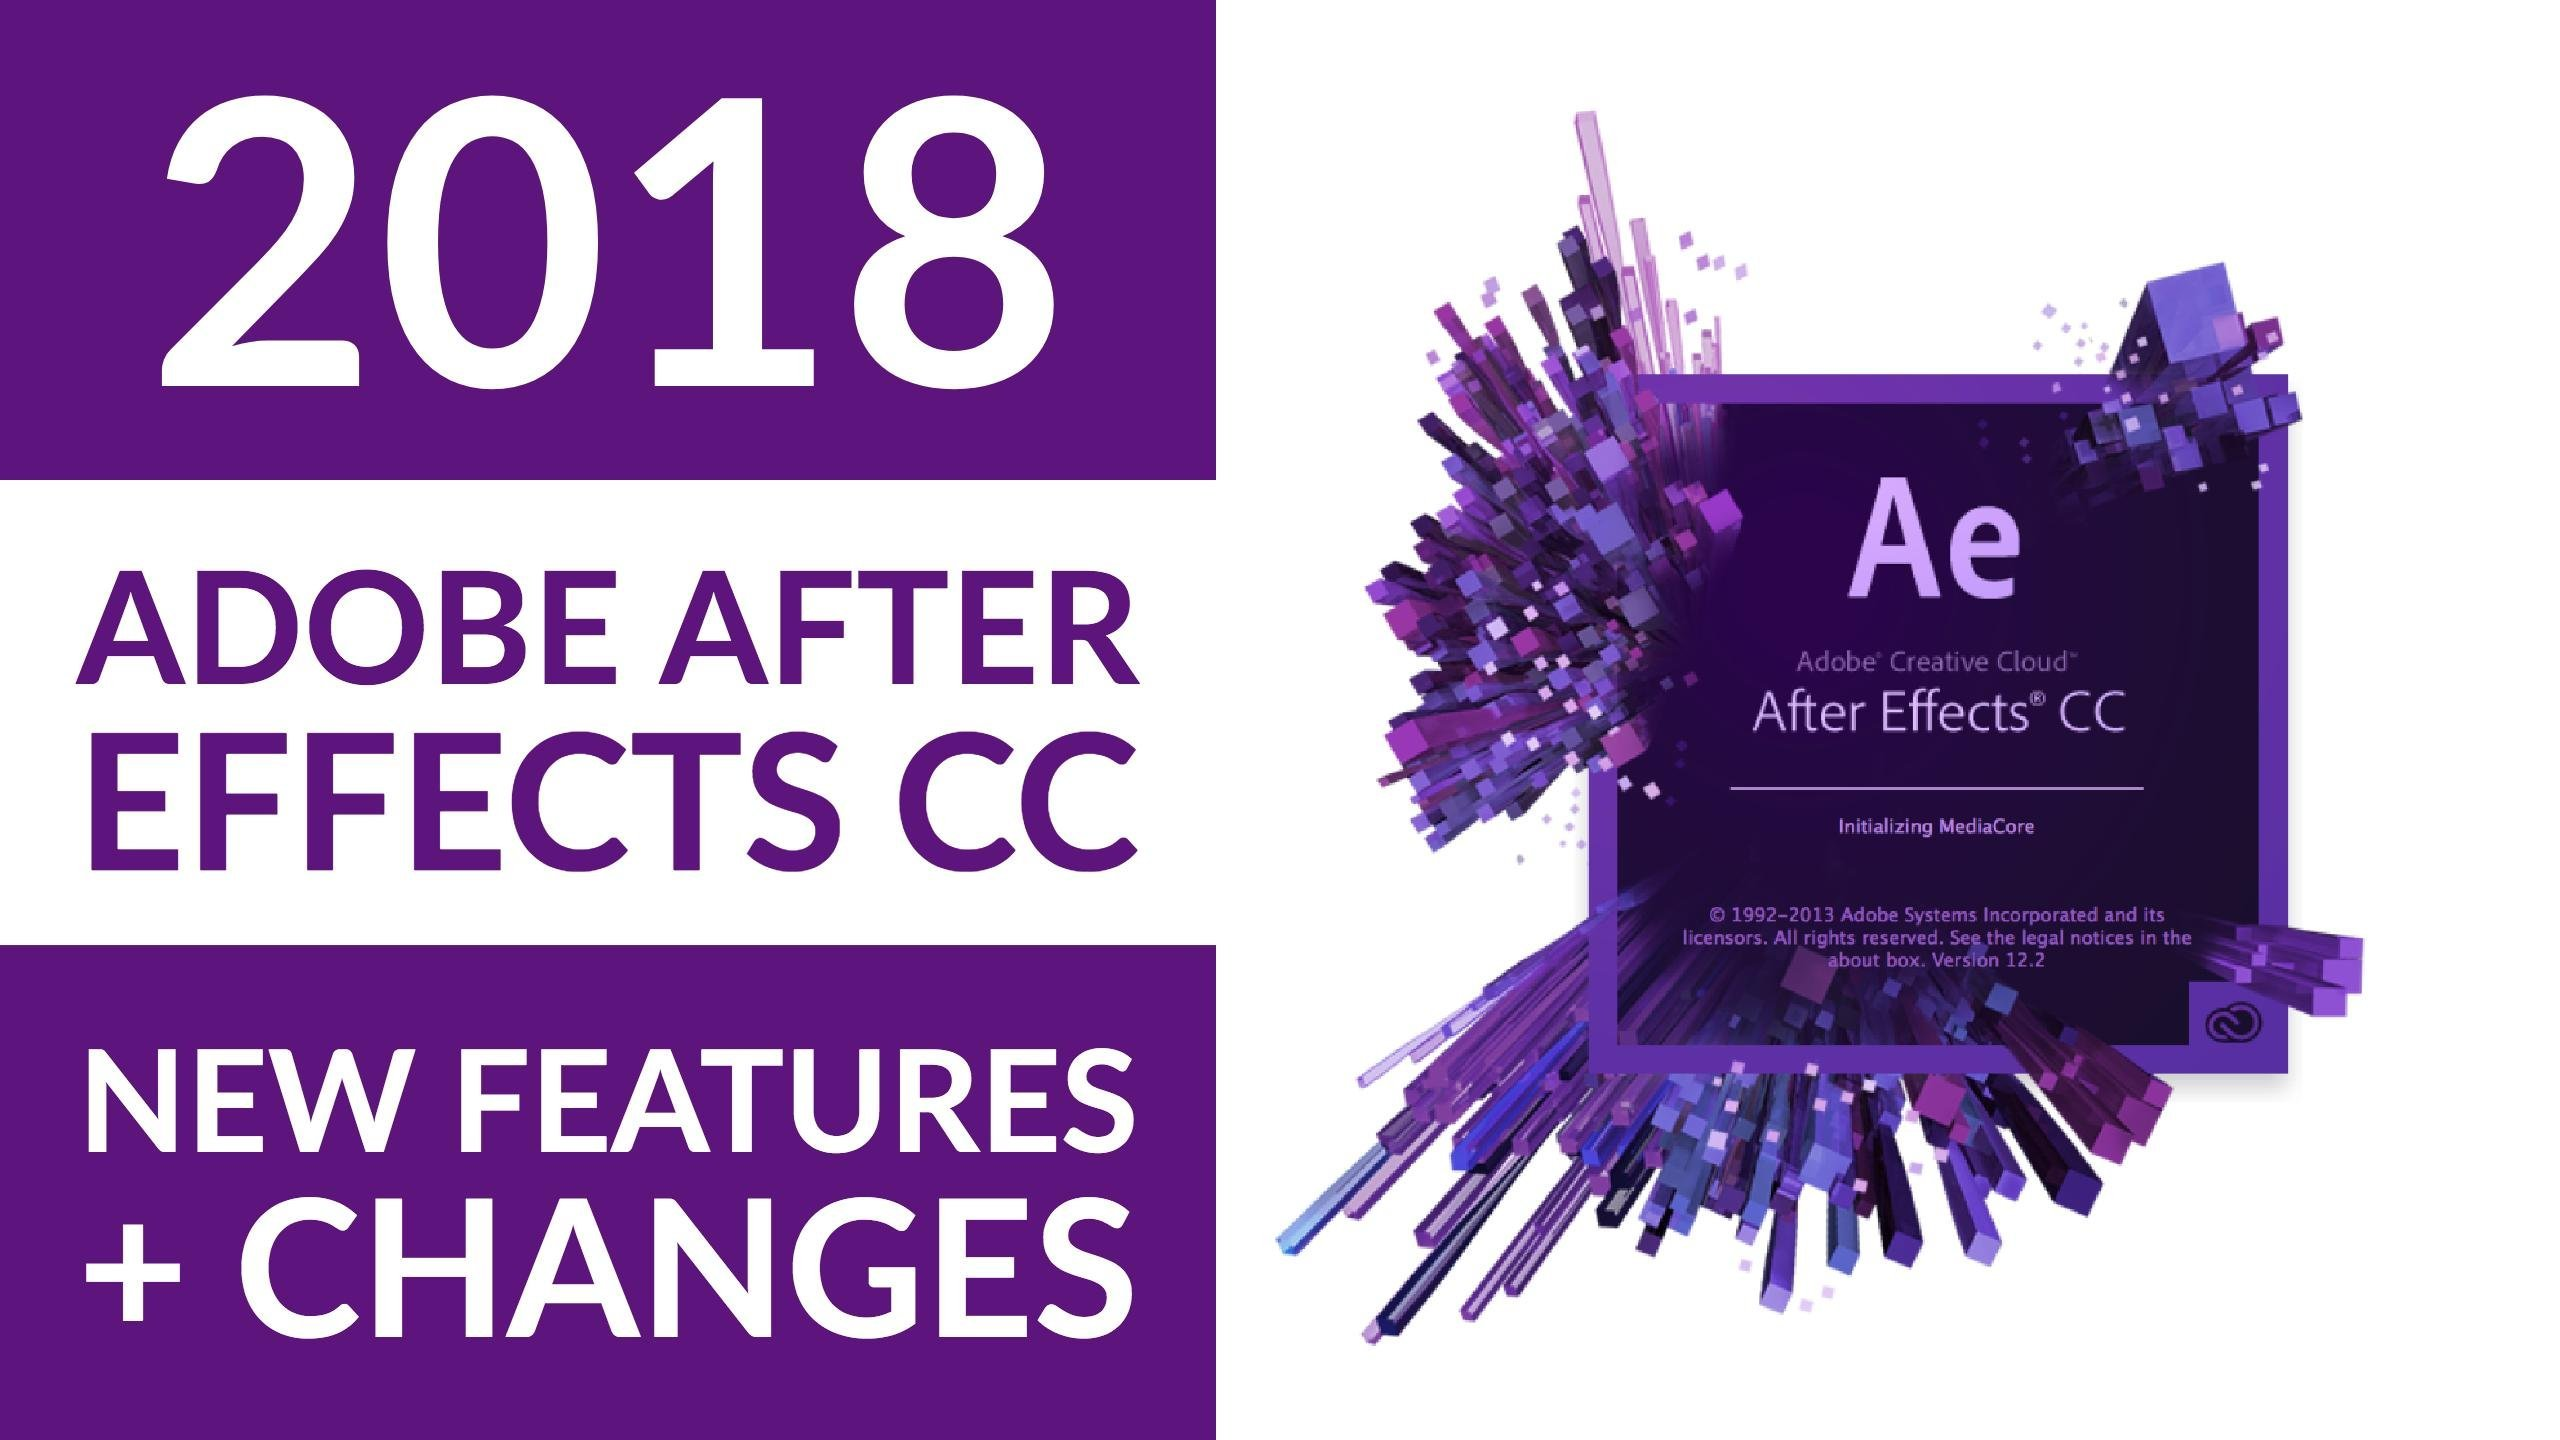 Adobe After Effects 2018 New Features | Daniel Scott